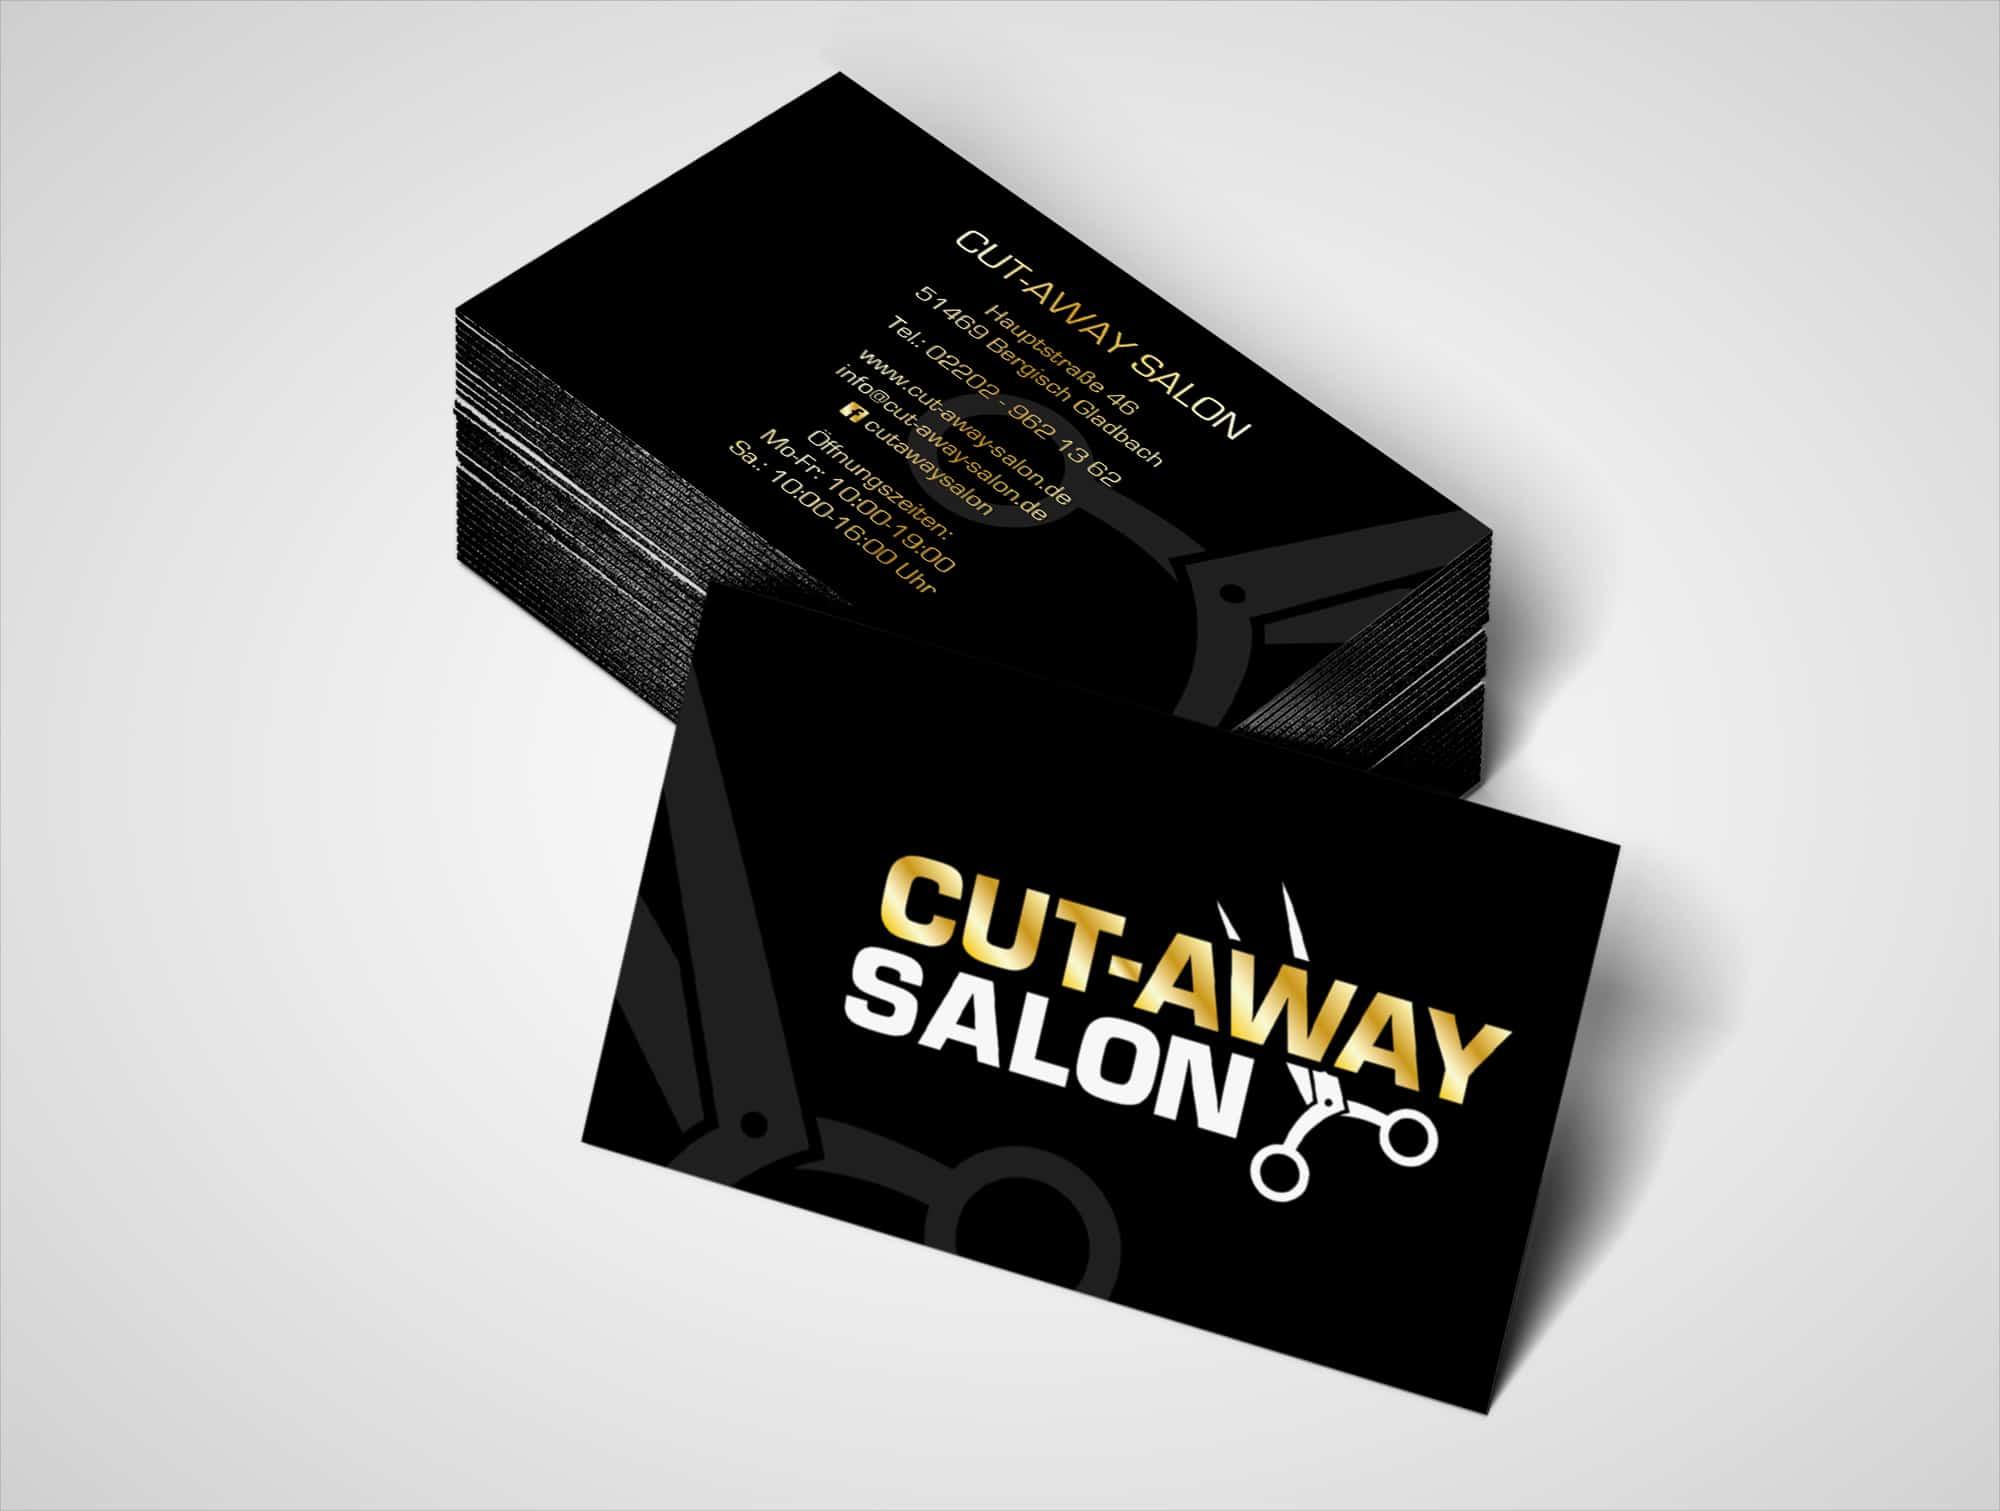 Exclusiv Transparente Kunststoff Visitenkarte Salonkarte